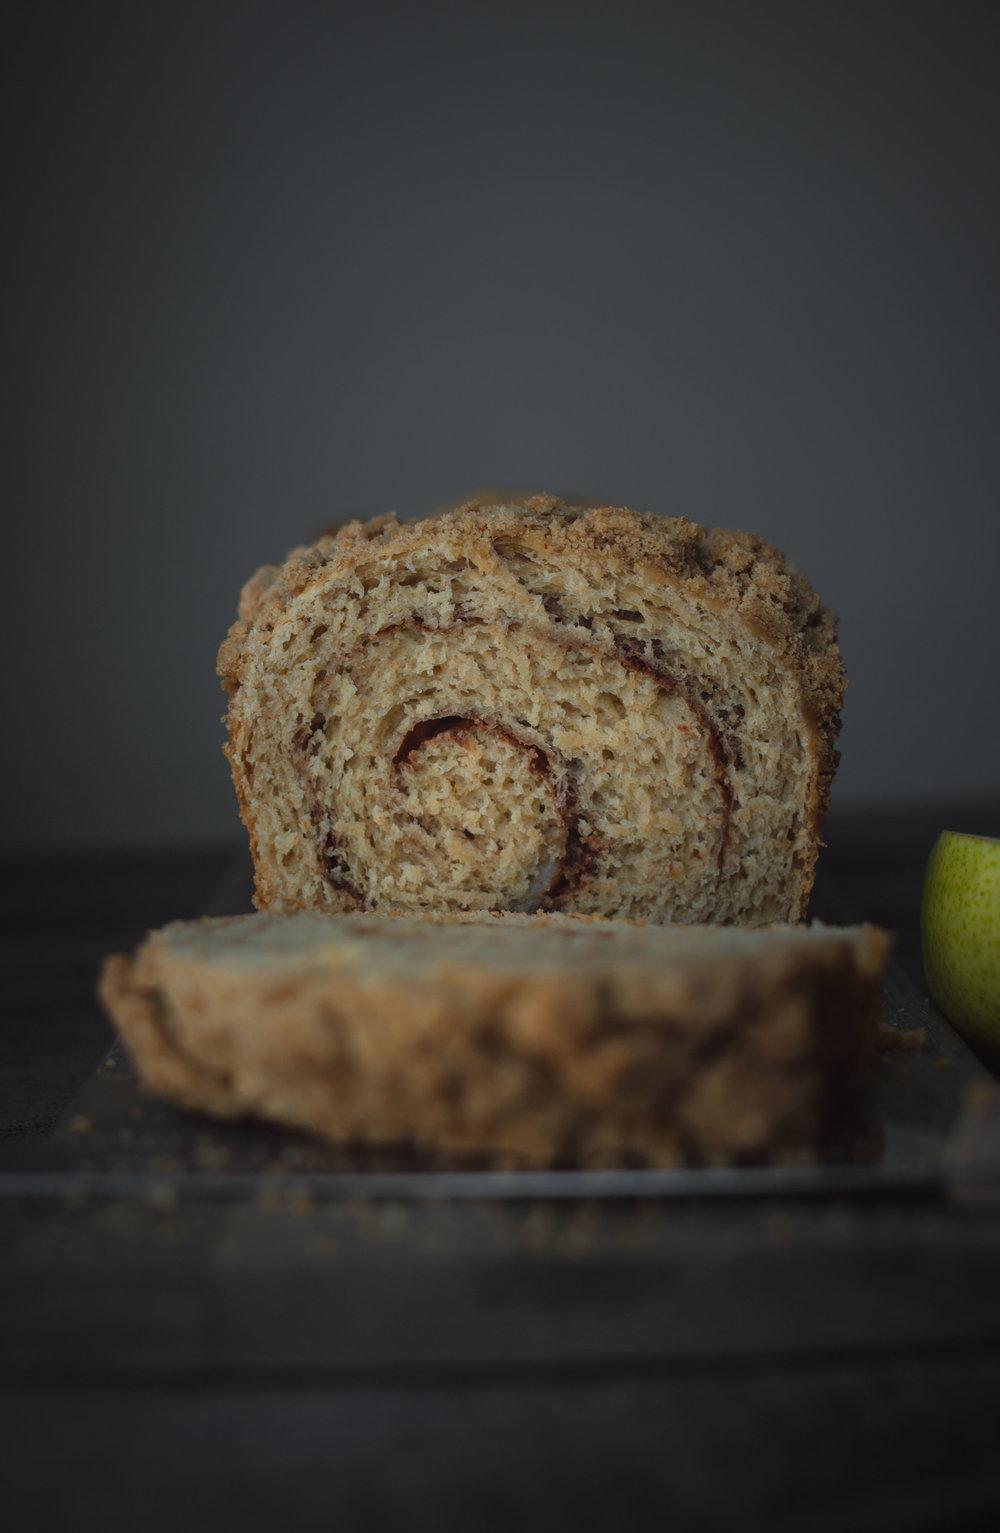 Pear cinnamon swirl bread--yeast bread series #MuchBreaderTogether | from scratch, mostly